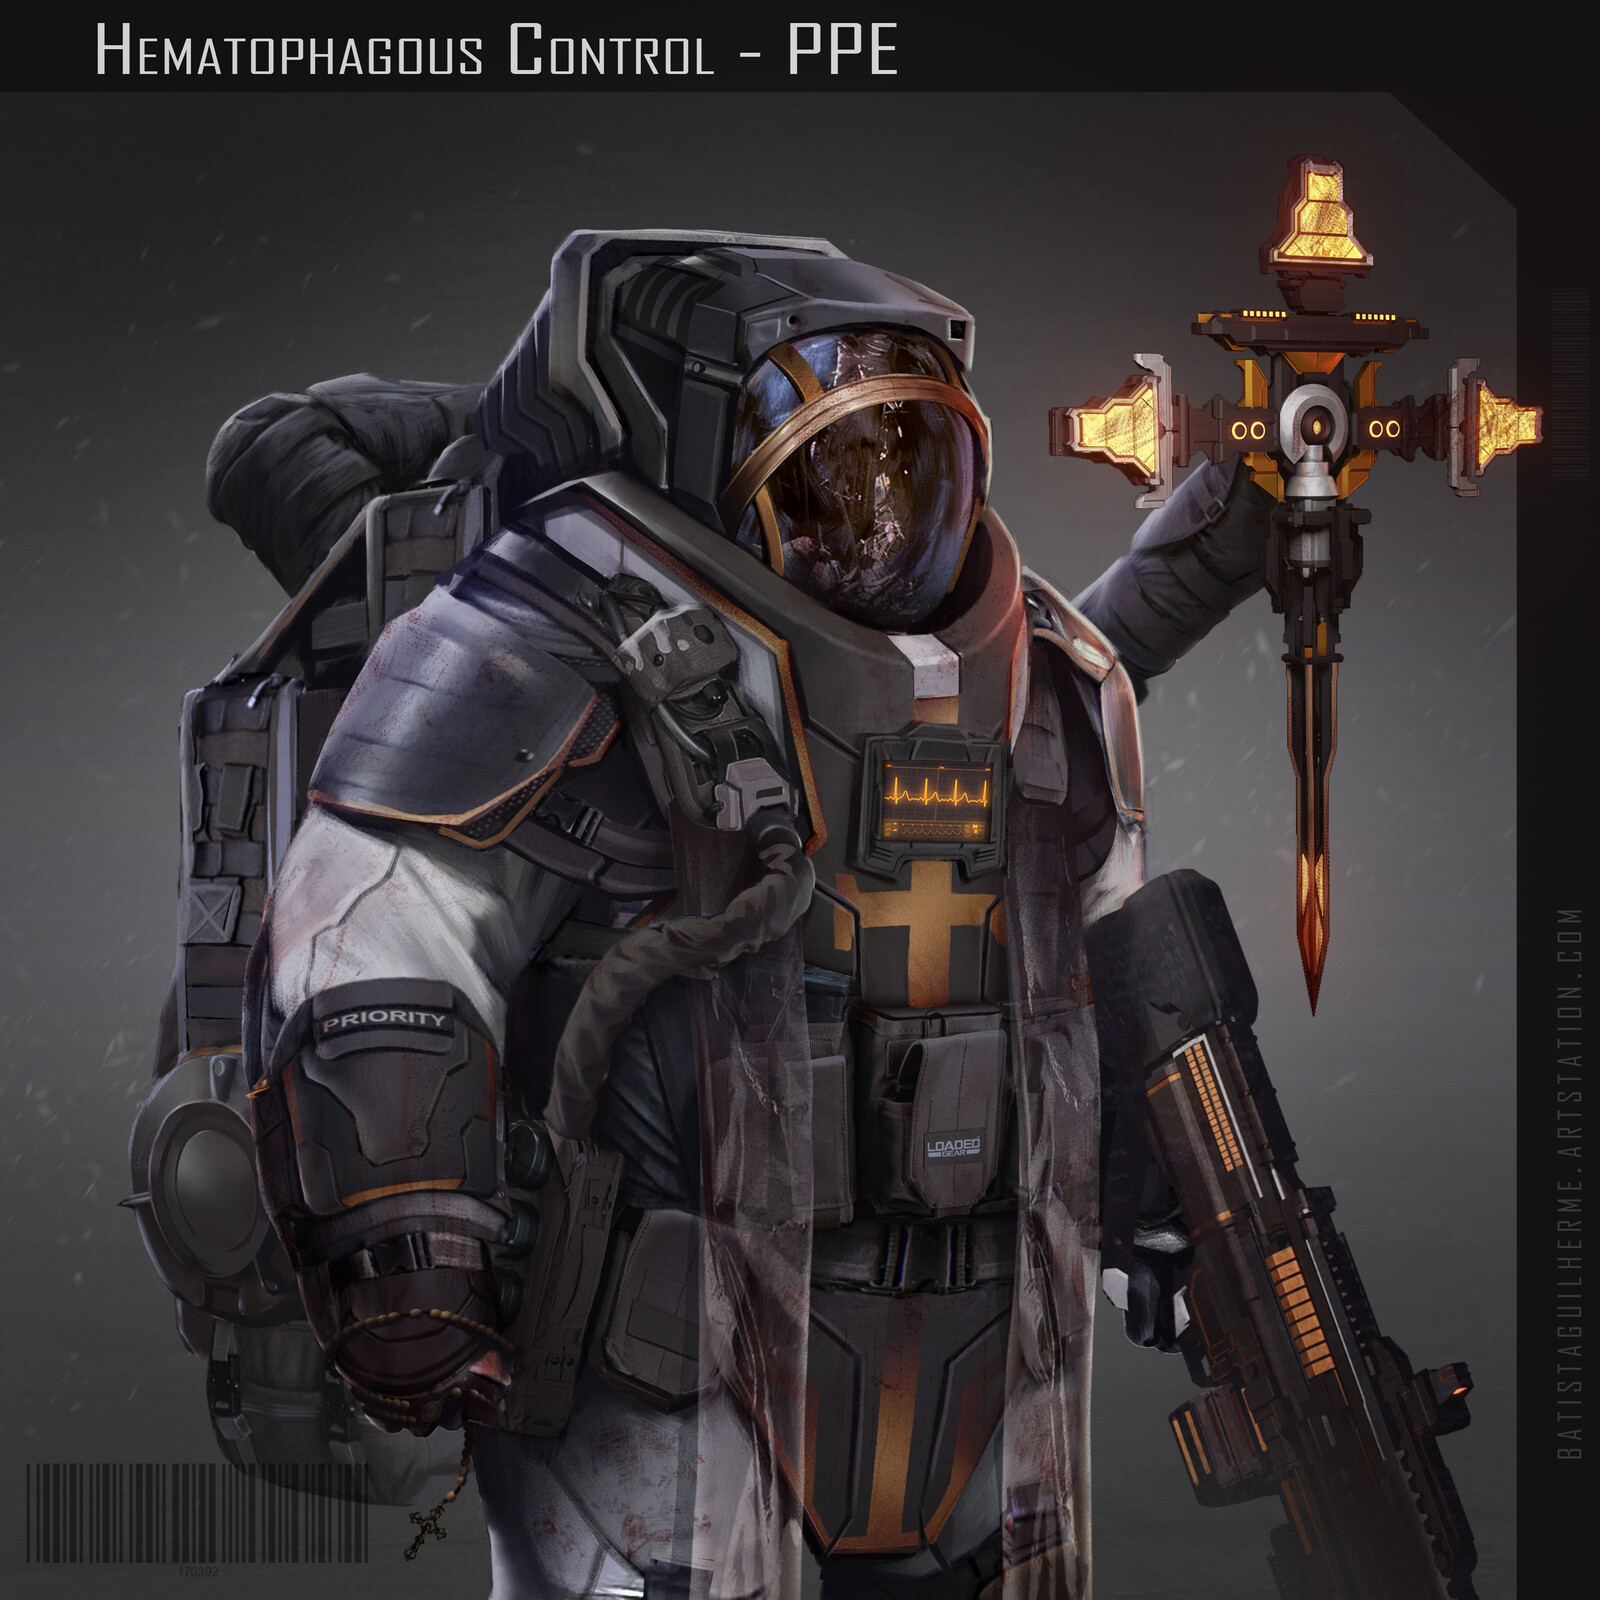 Hematophagous Control - PPE